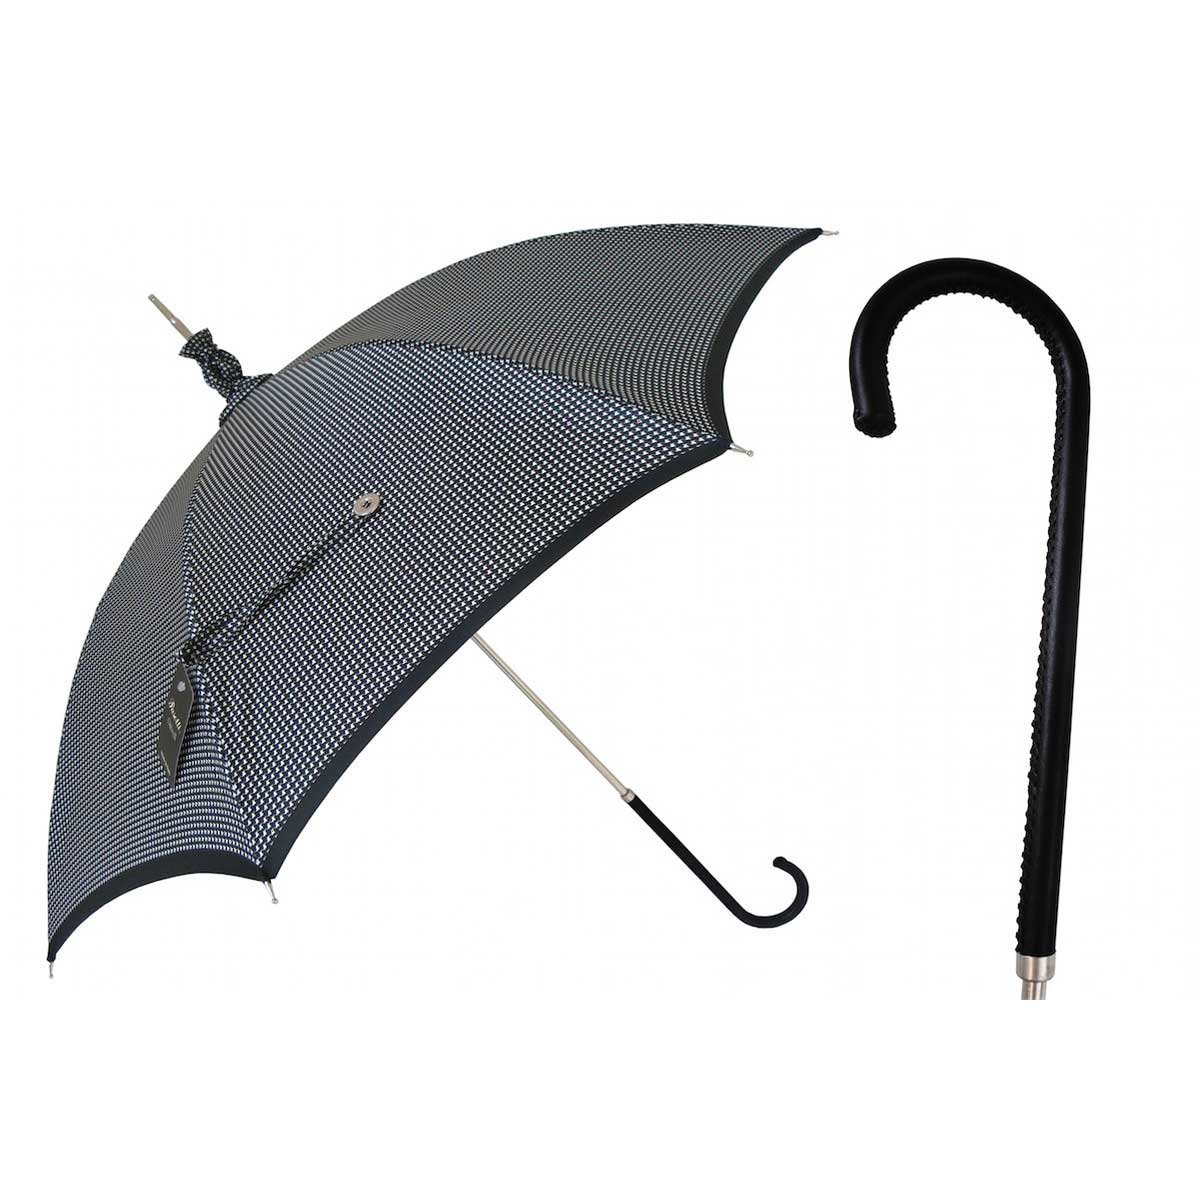 pasotti ombrelli pied de poule parasol women 39 s umbrella. Black Bedroom Furniture Sets. Home Design Ideas